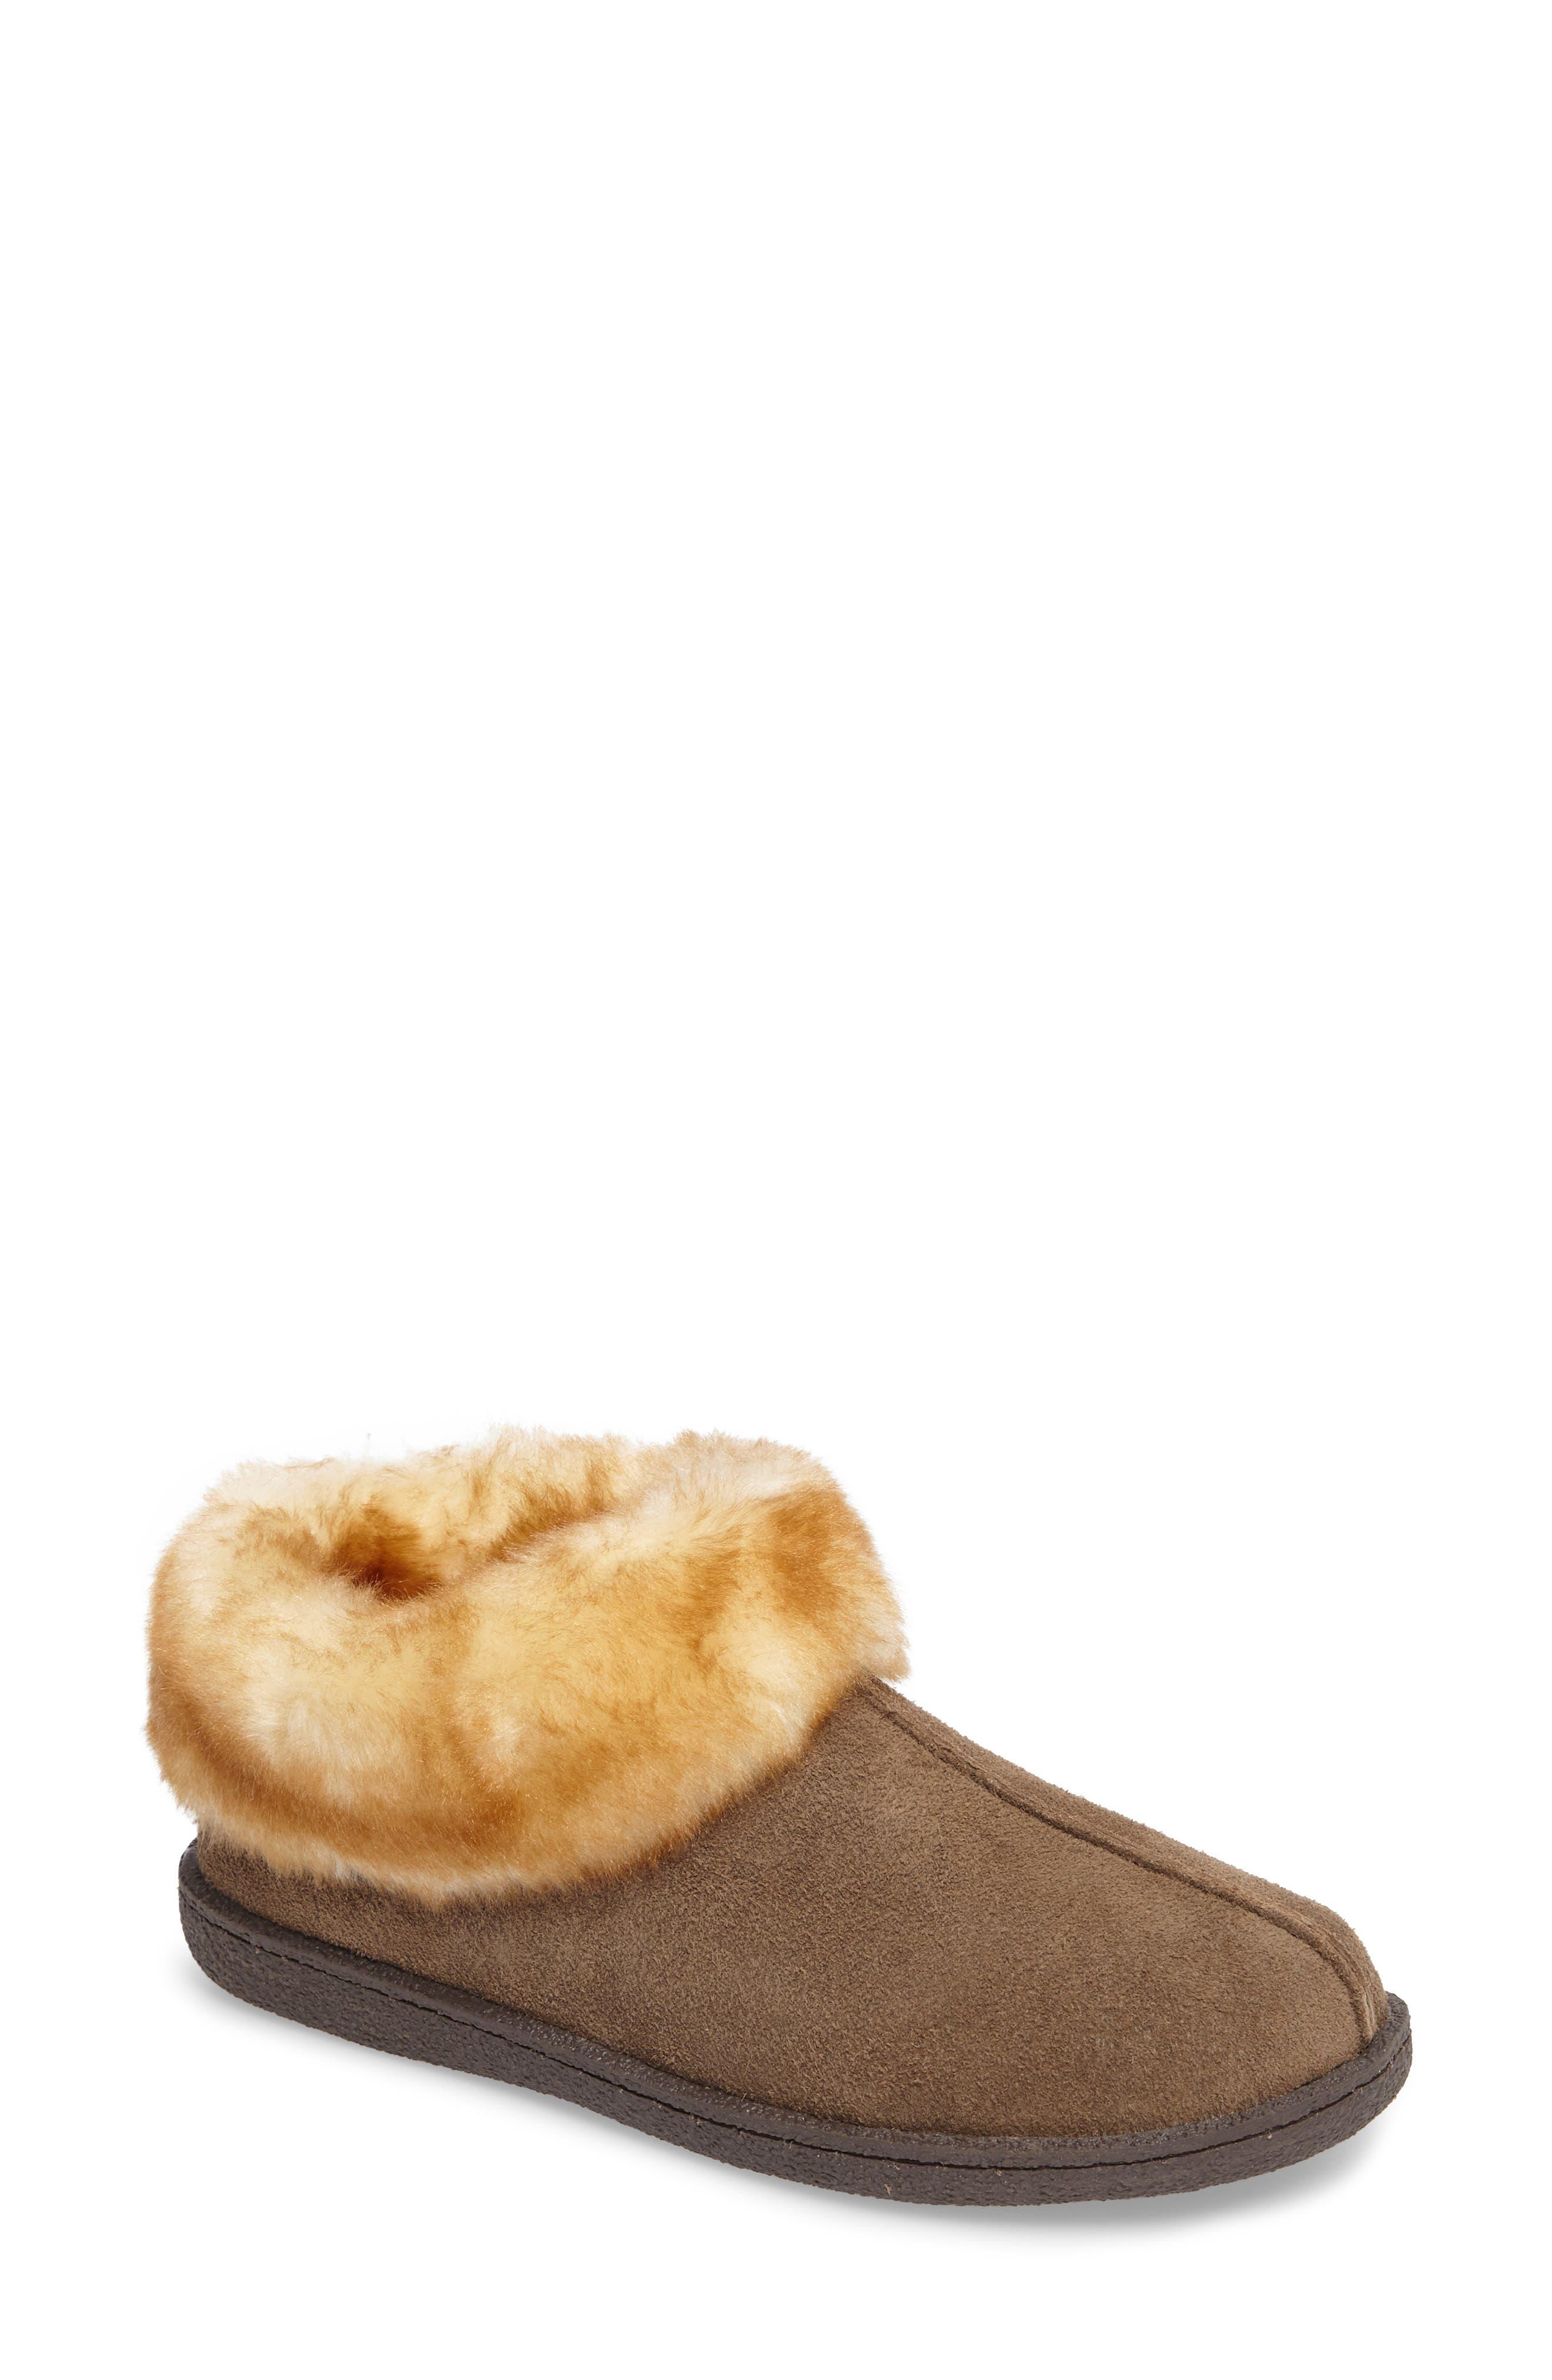 Autumn Ridge II Faux Fur Slipper Bootie,                             Main thumbnail 1, color,                             Walnut Suede